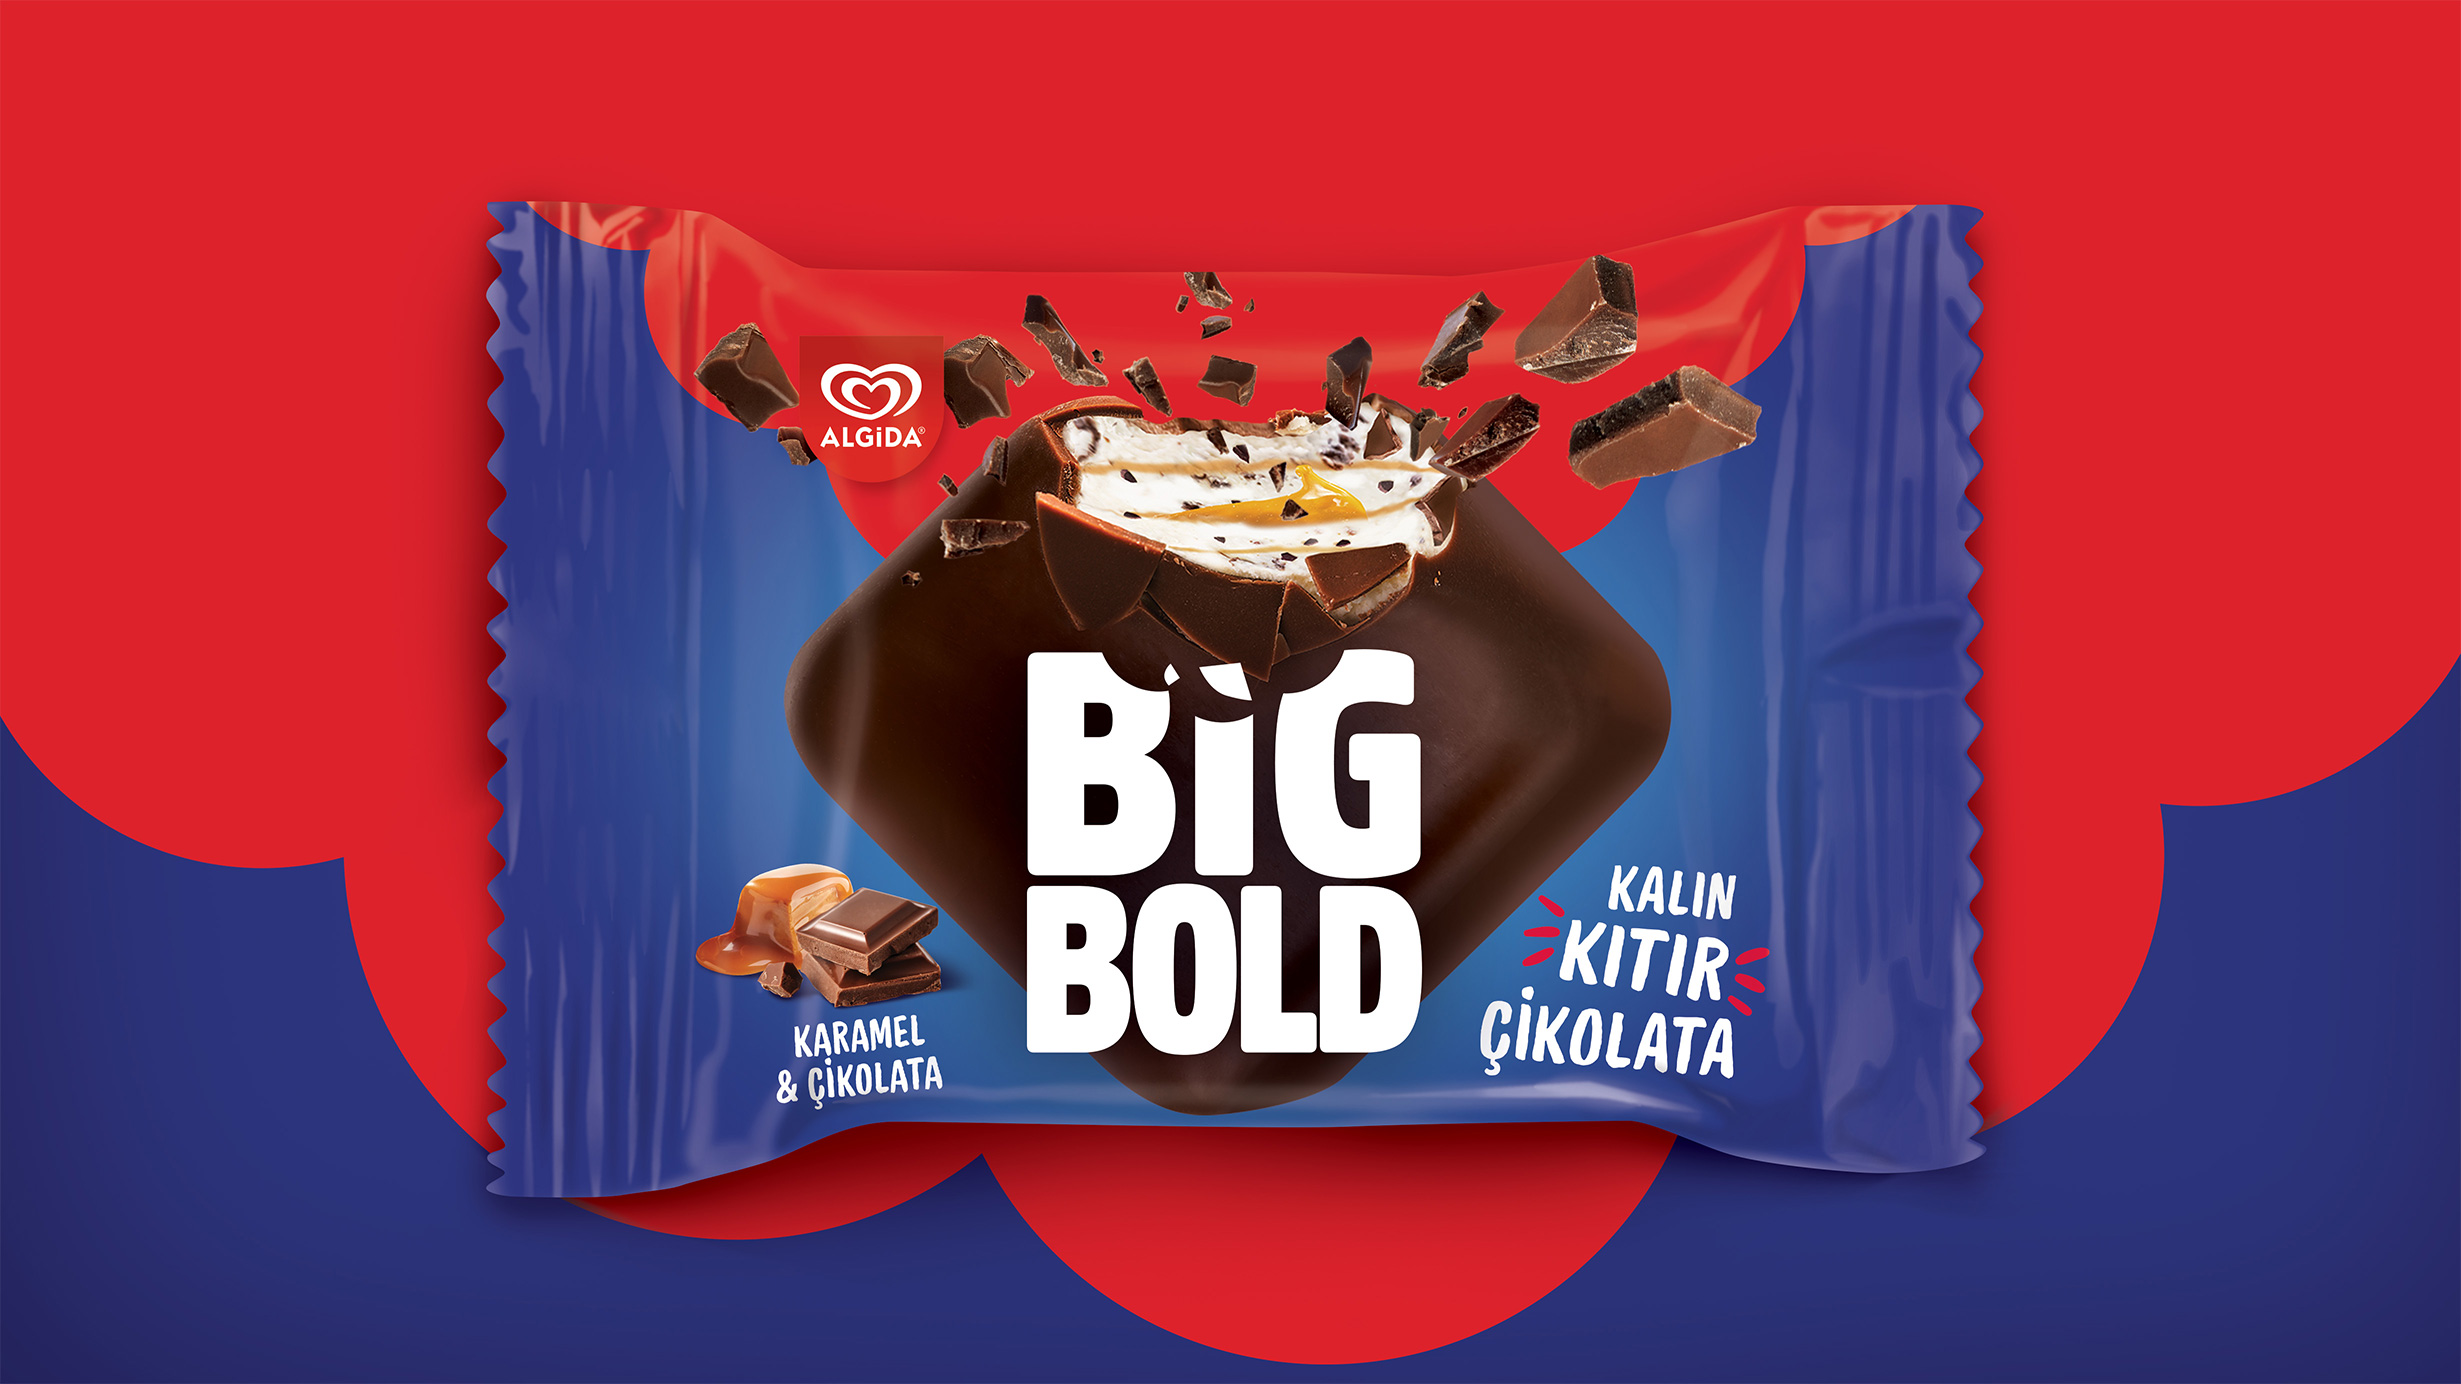 Algida Big Bold Packaging Design from Orhan Irmak Tasarim